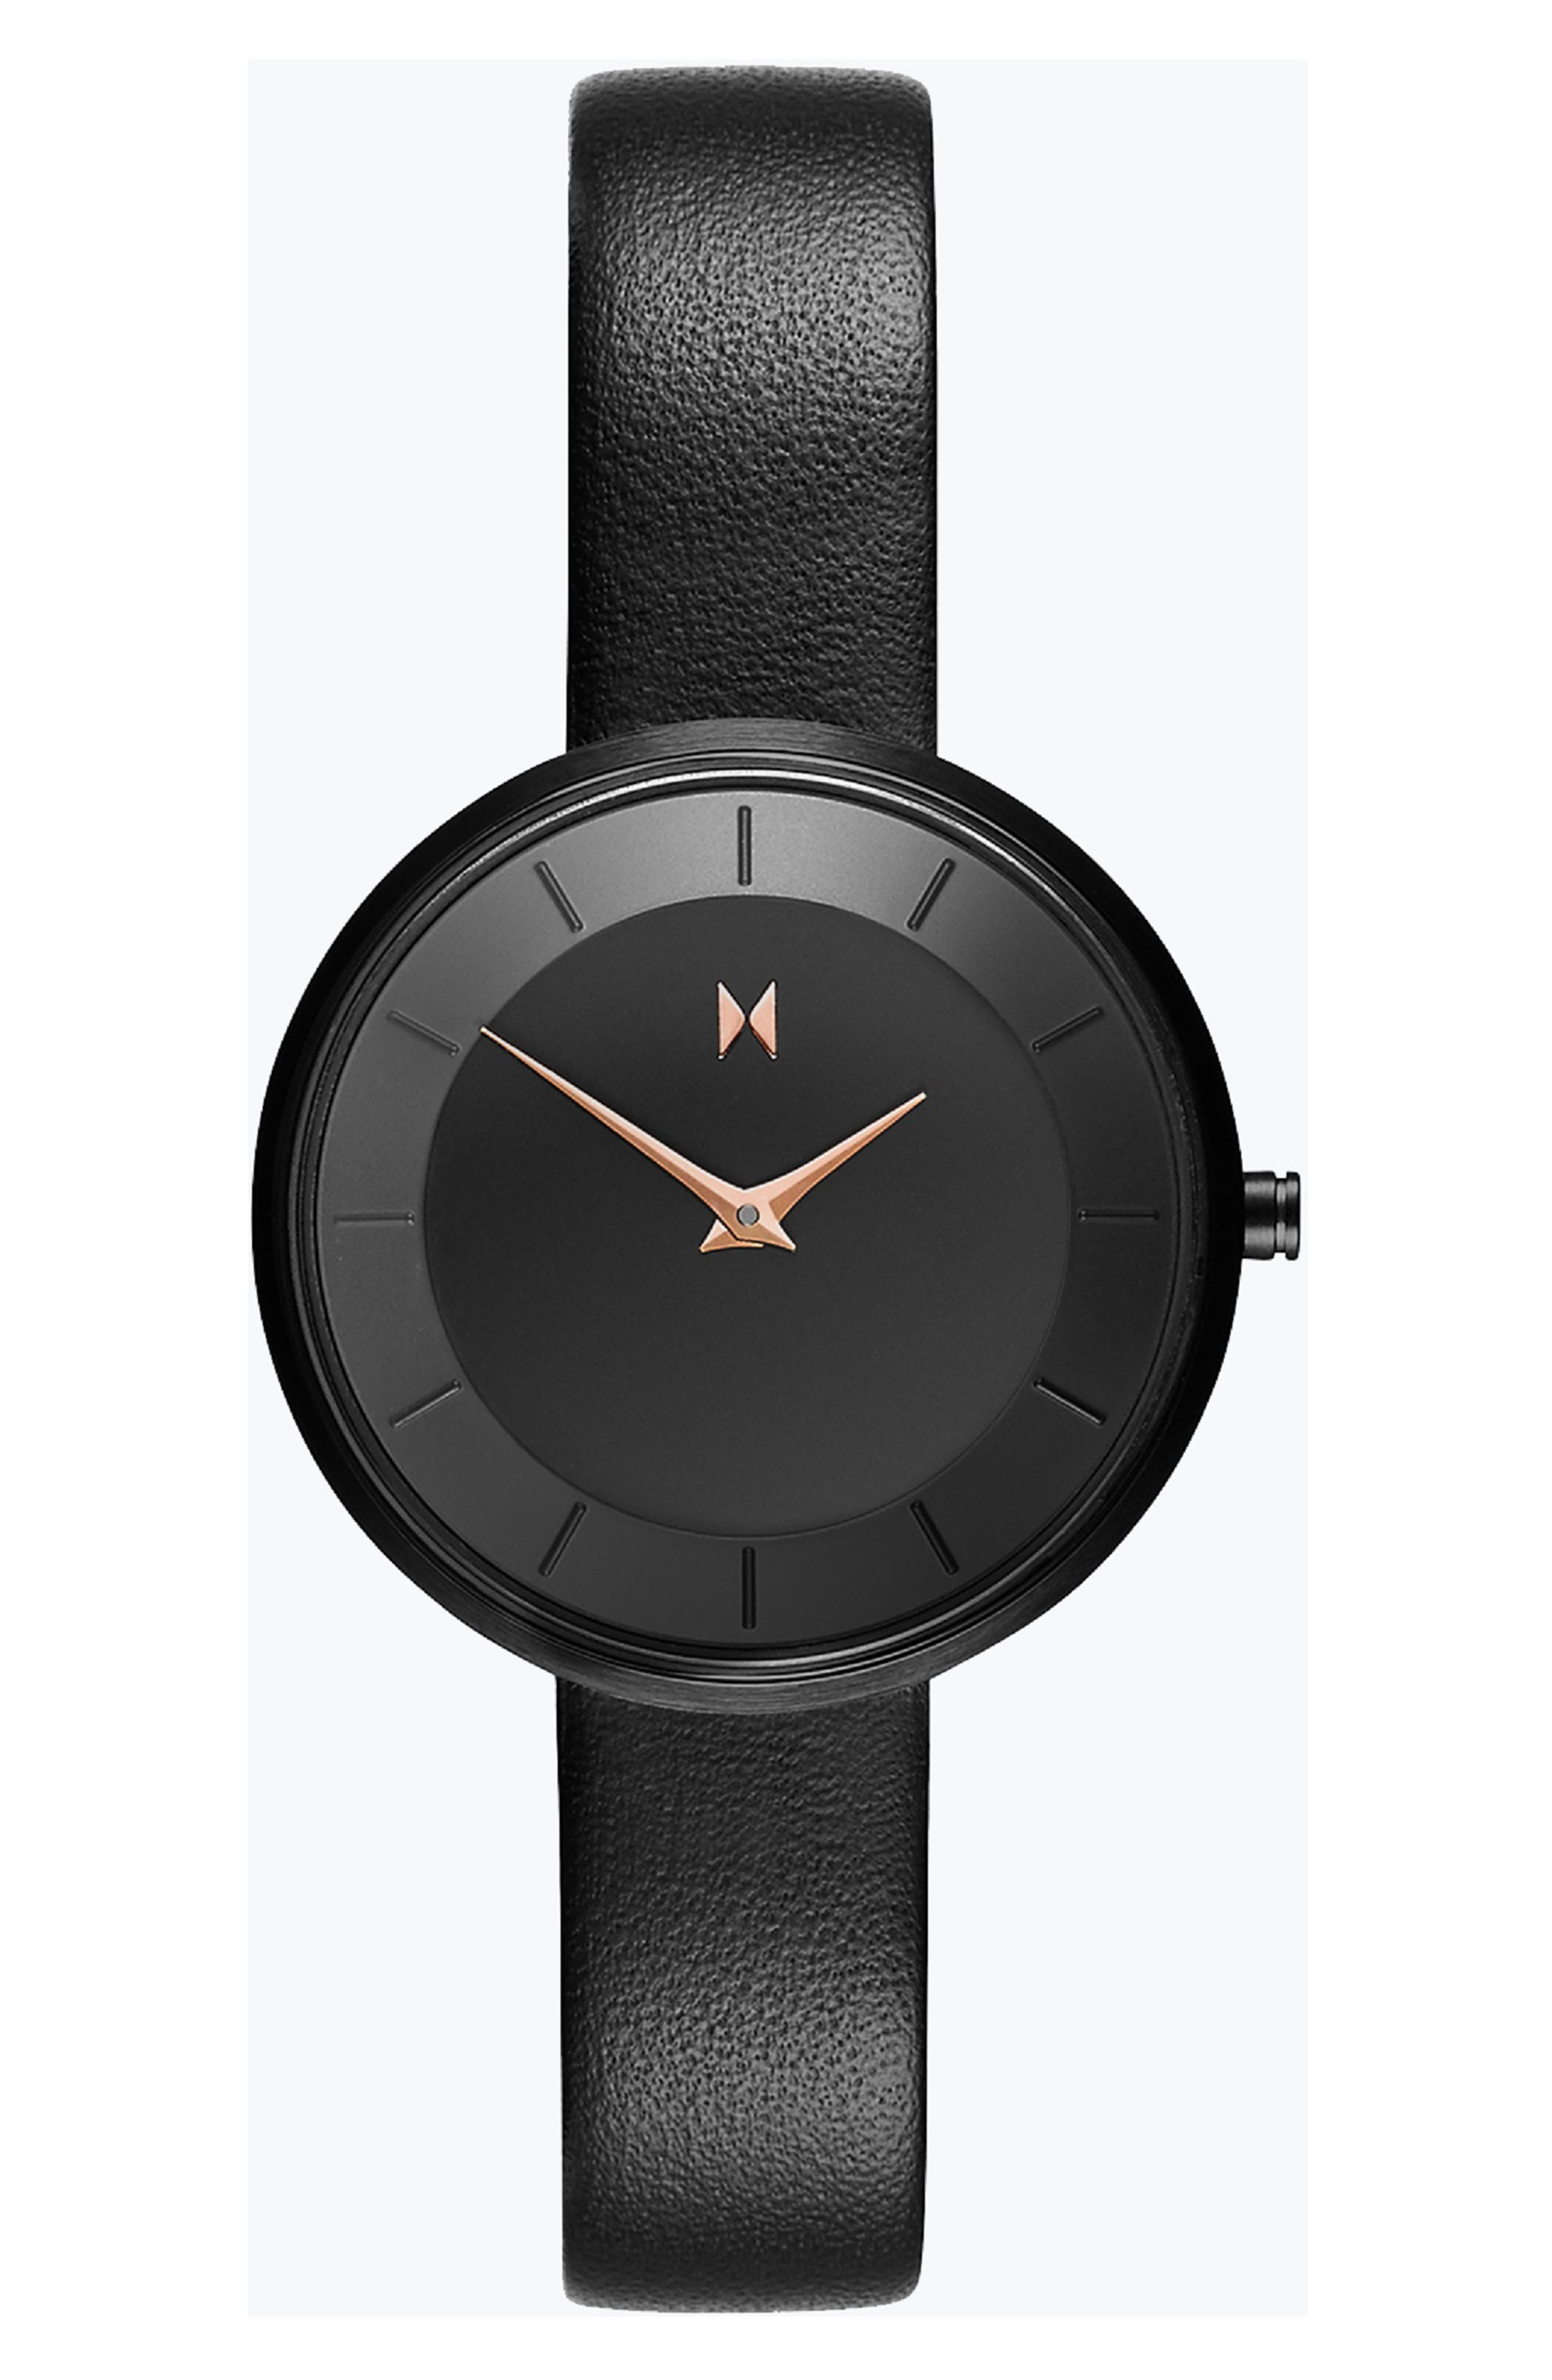 MVMT Mod Leather Strap Watch, 32Mm in Black